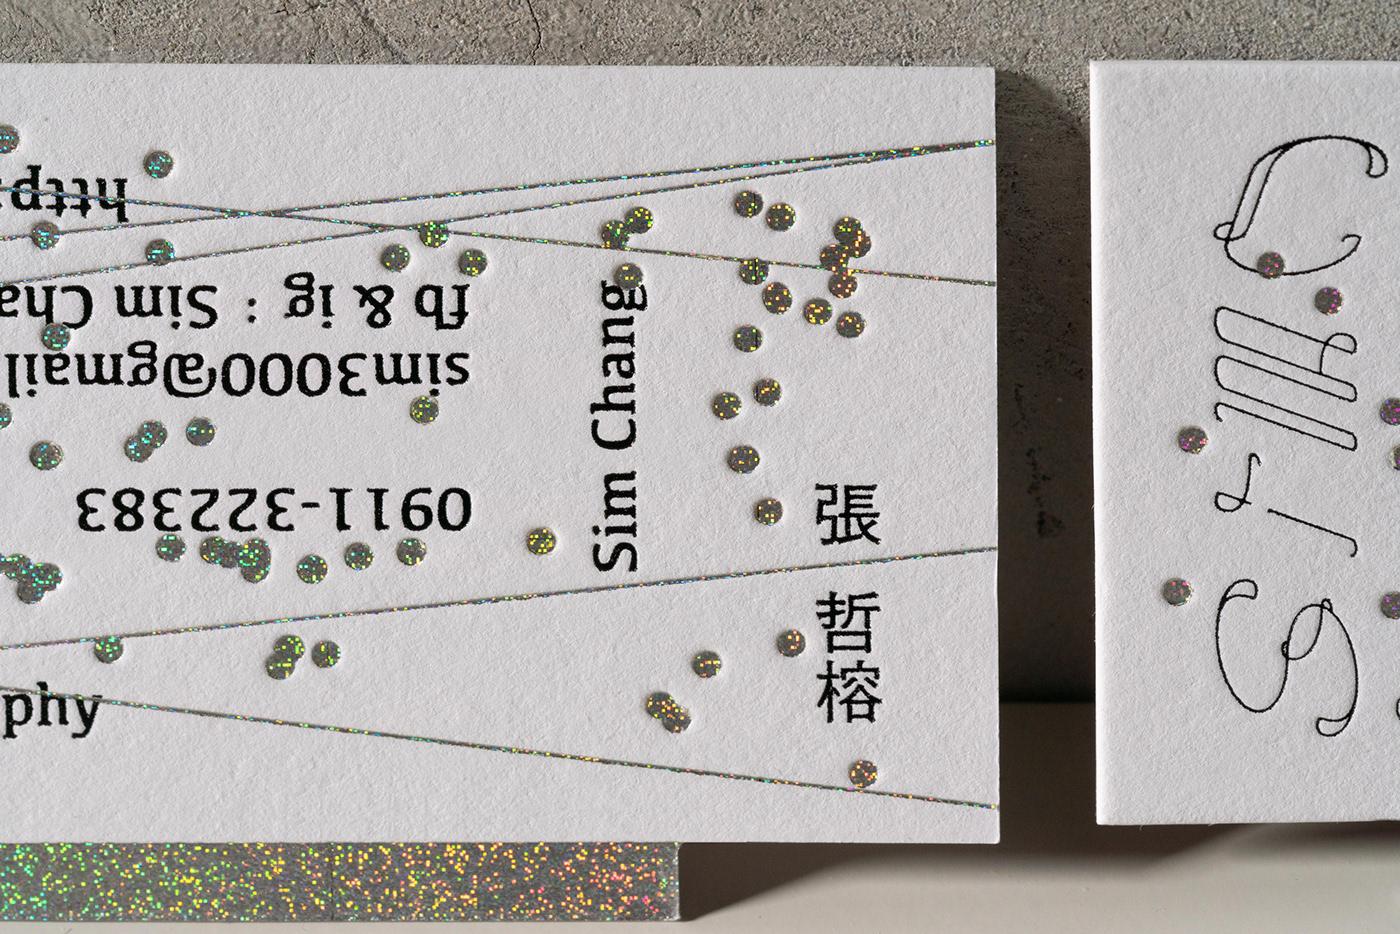 Sim Chang Photography 張哲榕 草屯 南投 設計 namecard card laser business taiwan